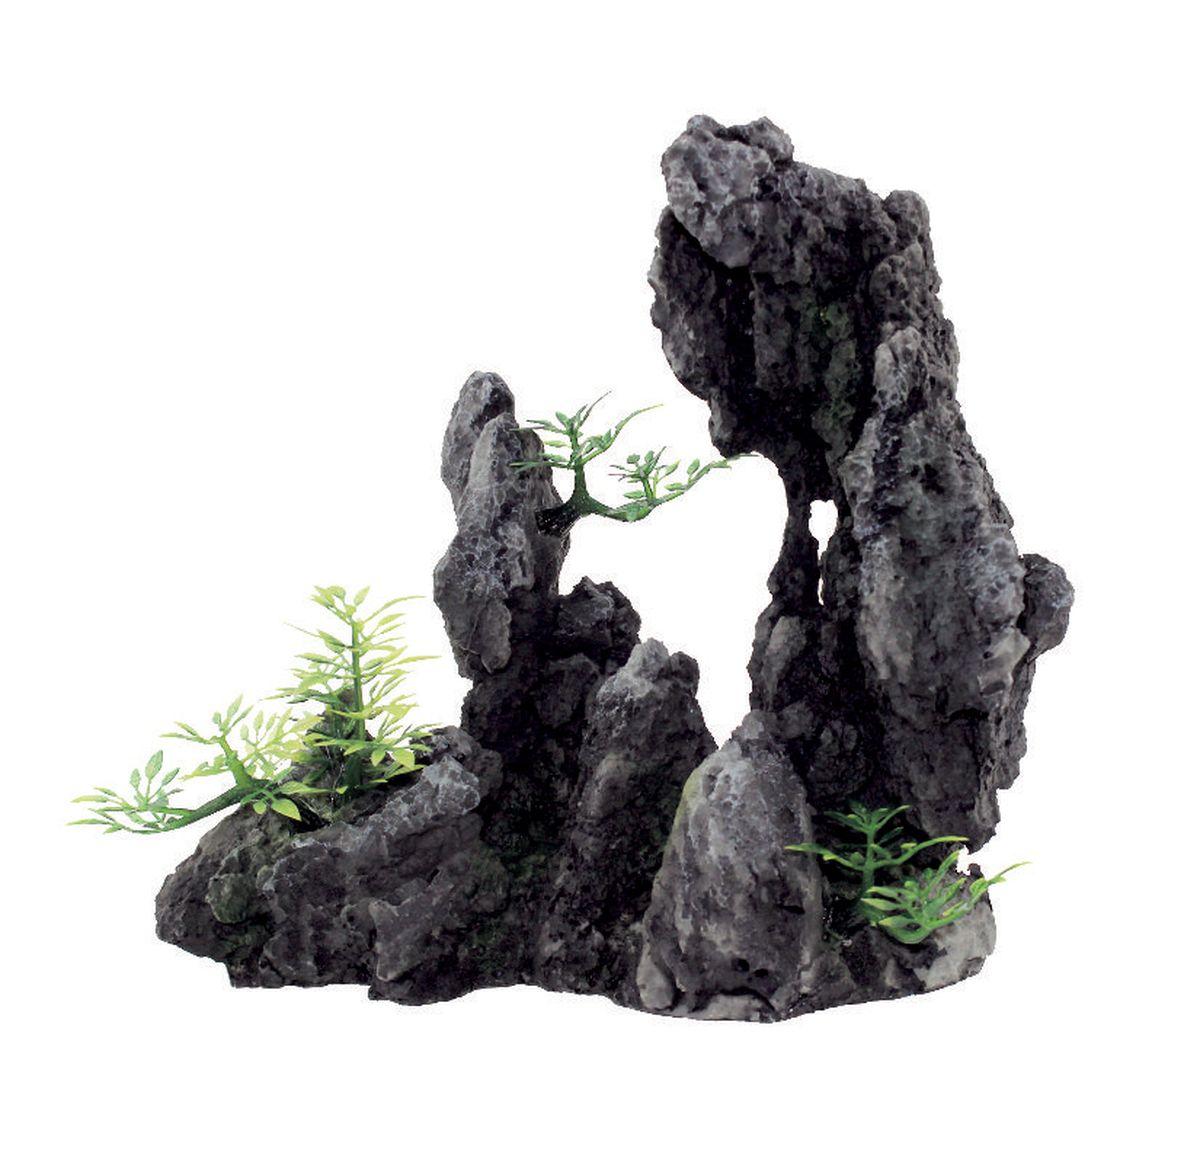 Декорация для аквариума ArtUniq Расщелина в скалах, 22,5 x 9,5 x 21,5 см0120710Декорация для аквариума ArtUniq Расщелина в скалах, 22,5 x 9,5 x 21,5 см